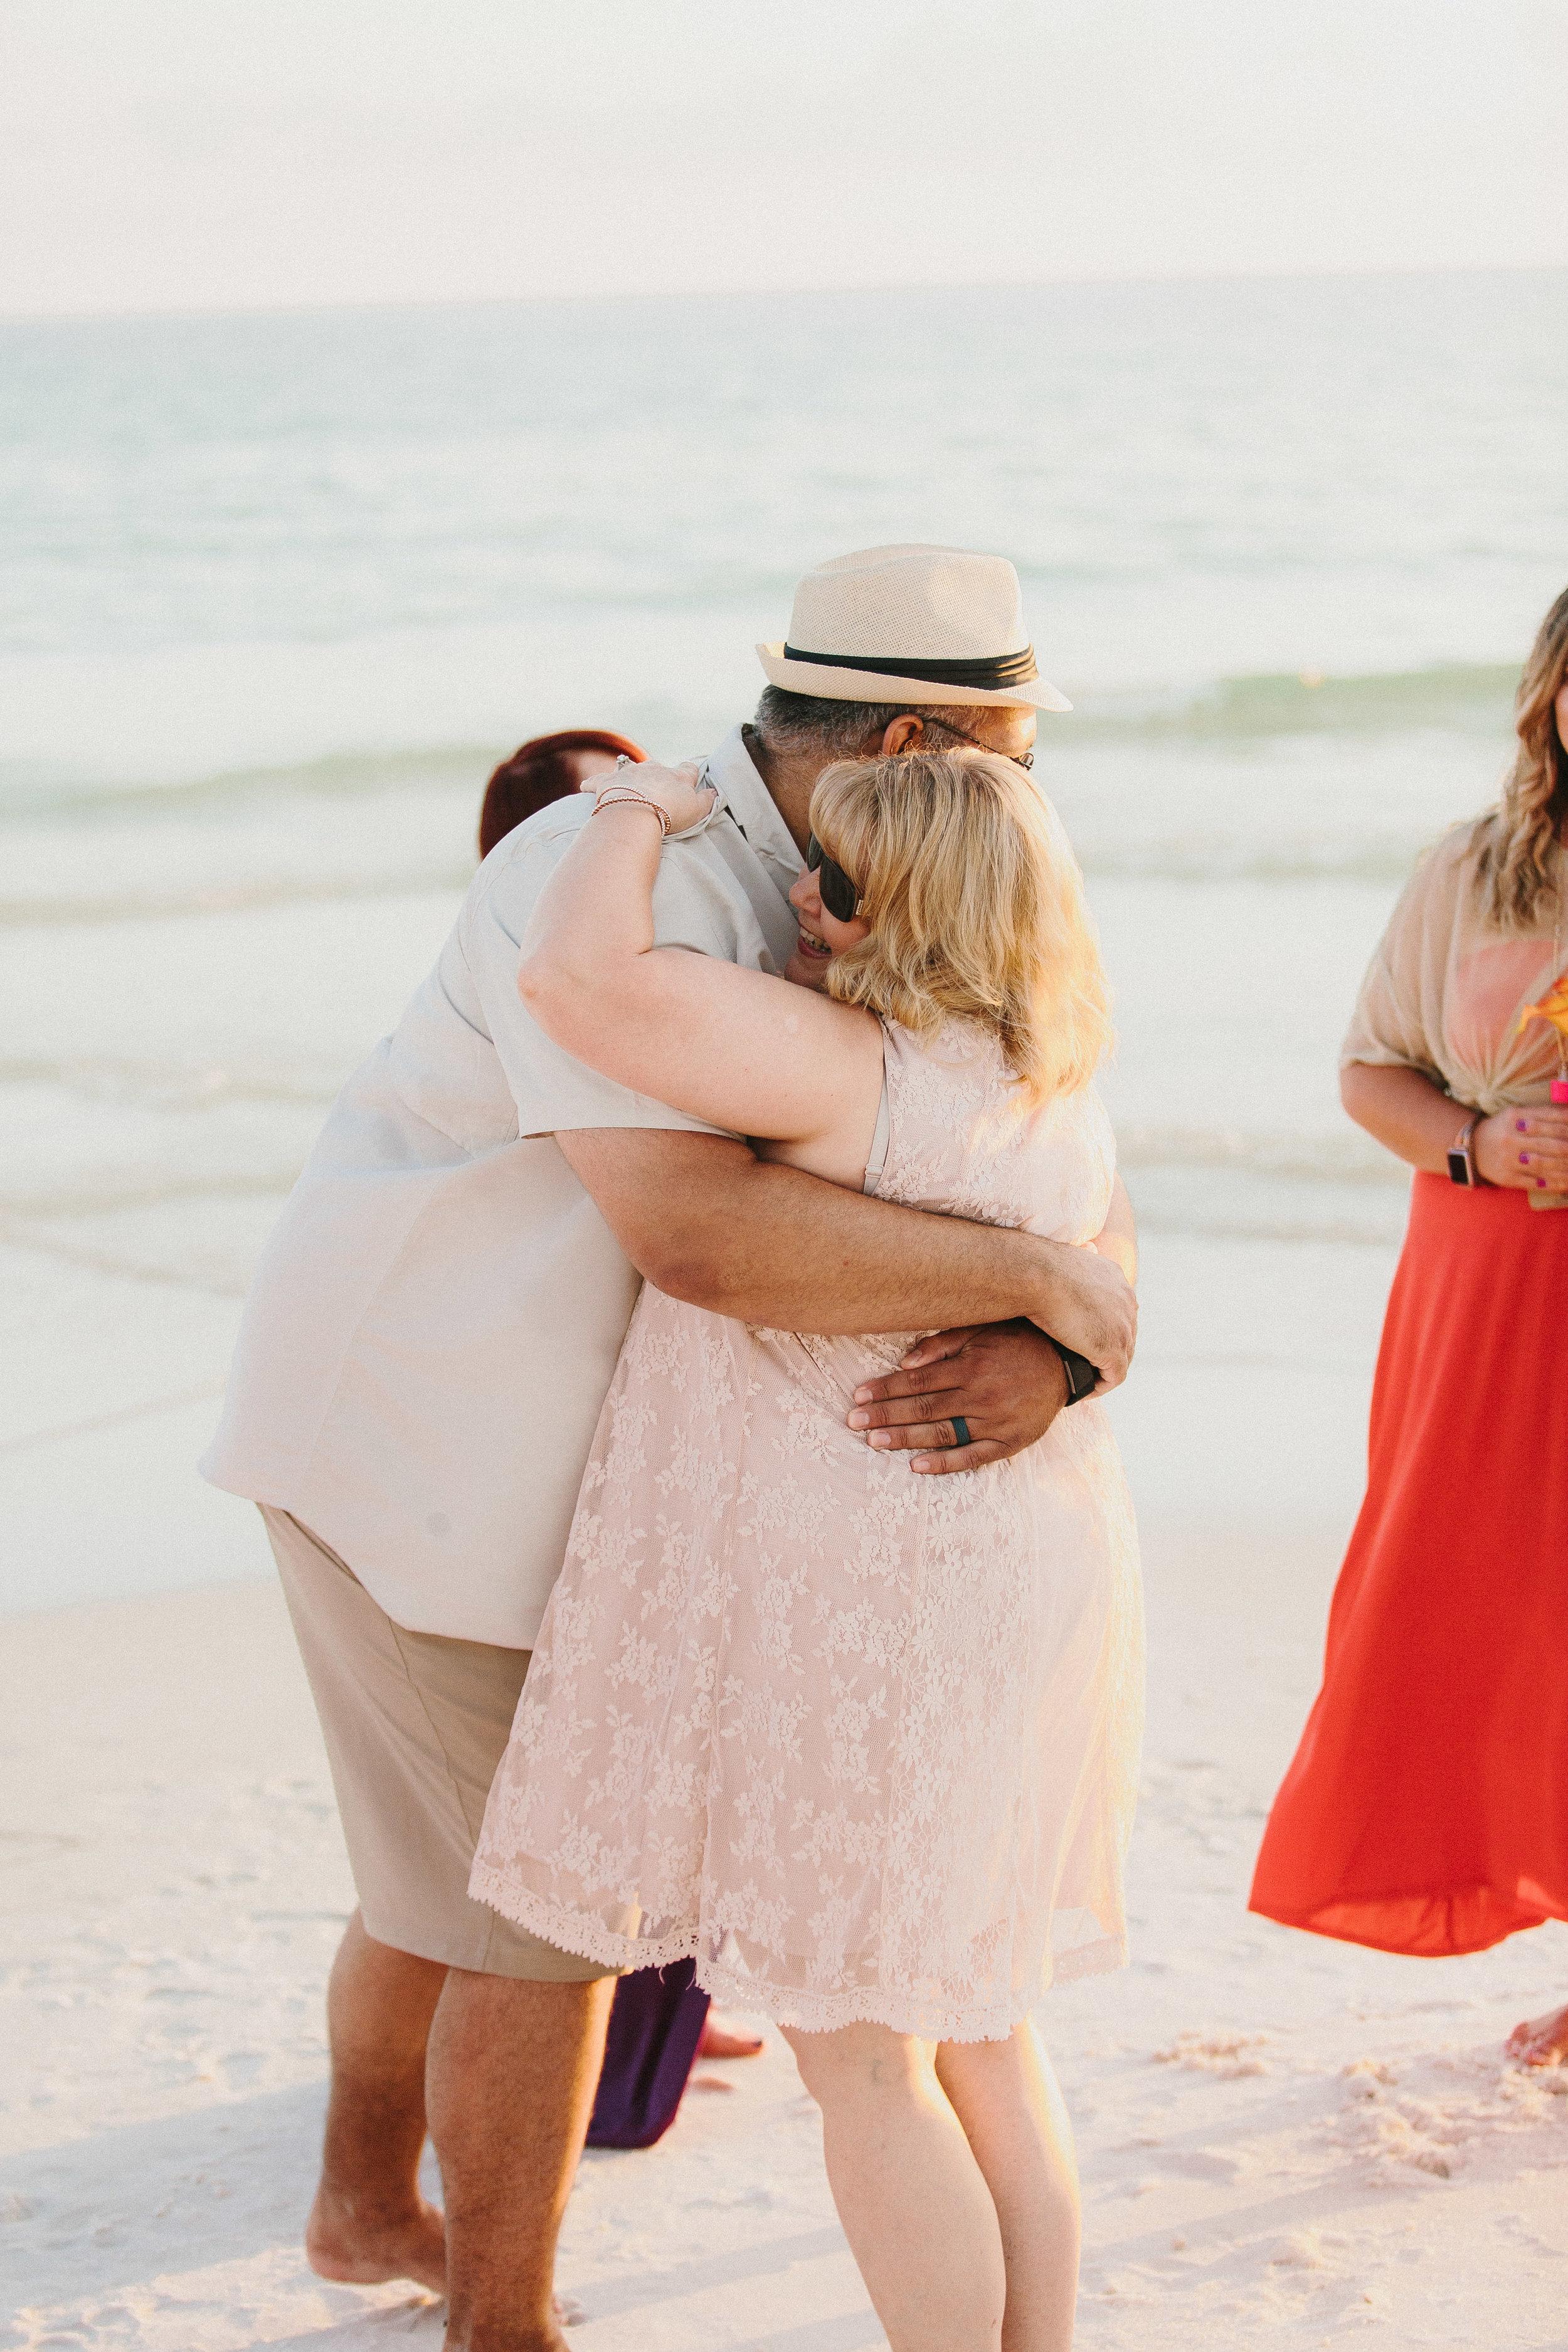 destin_sunset_beach_elopement_intimate_wedding_photographer_florida_documentary_1238.jpg